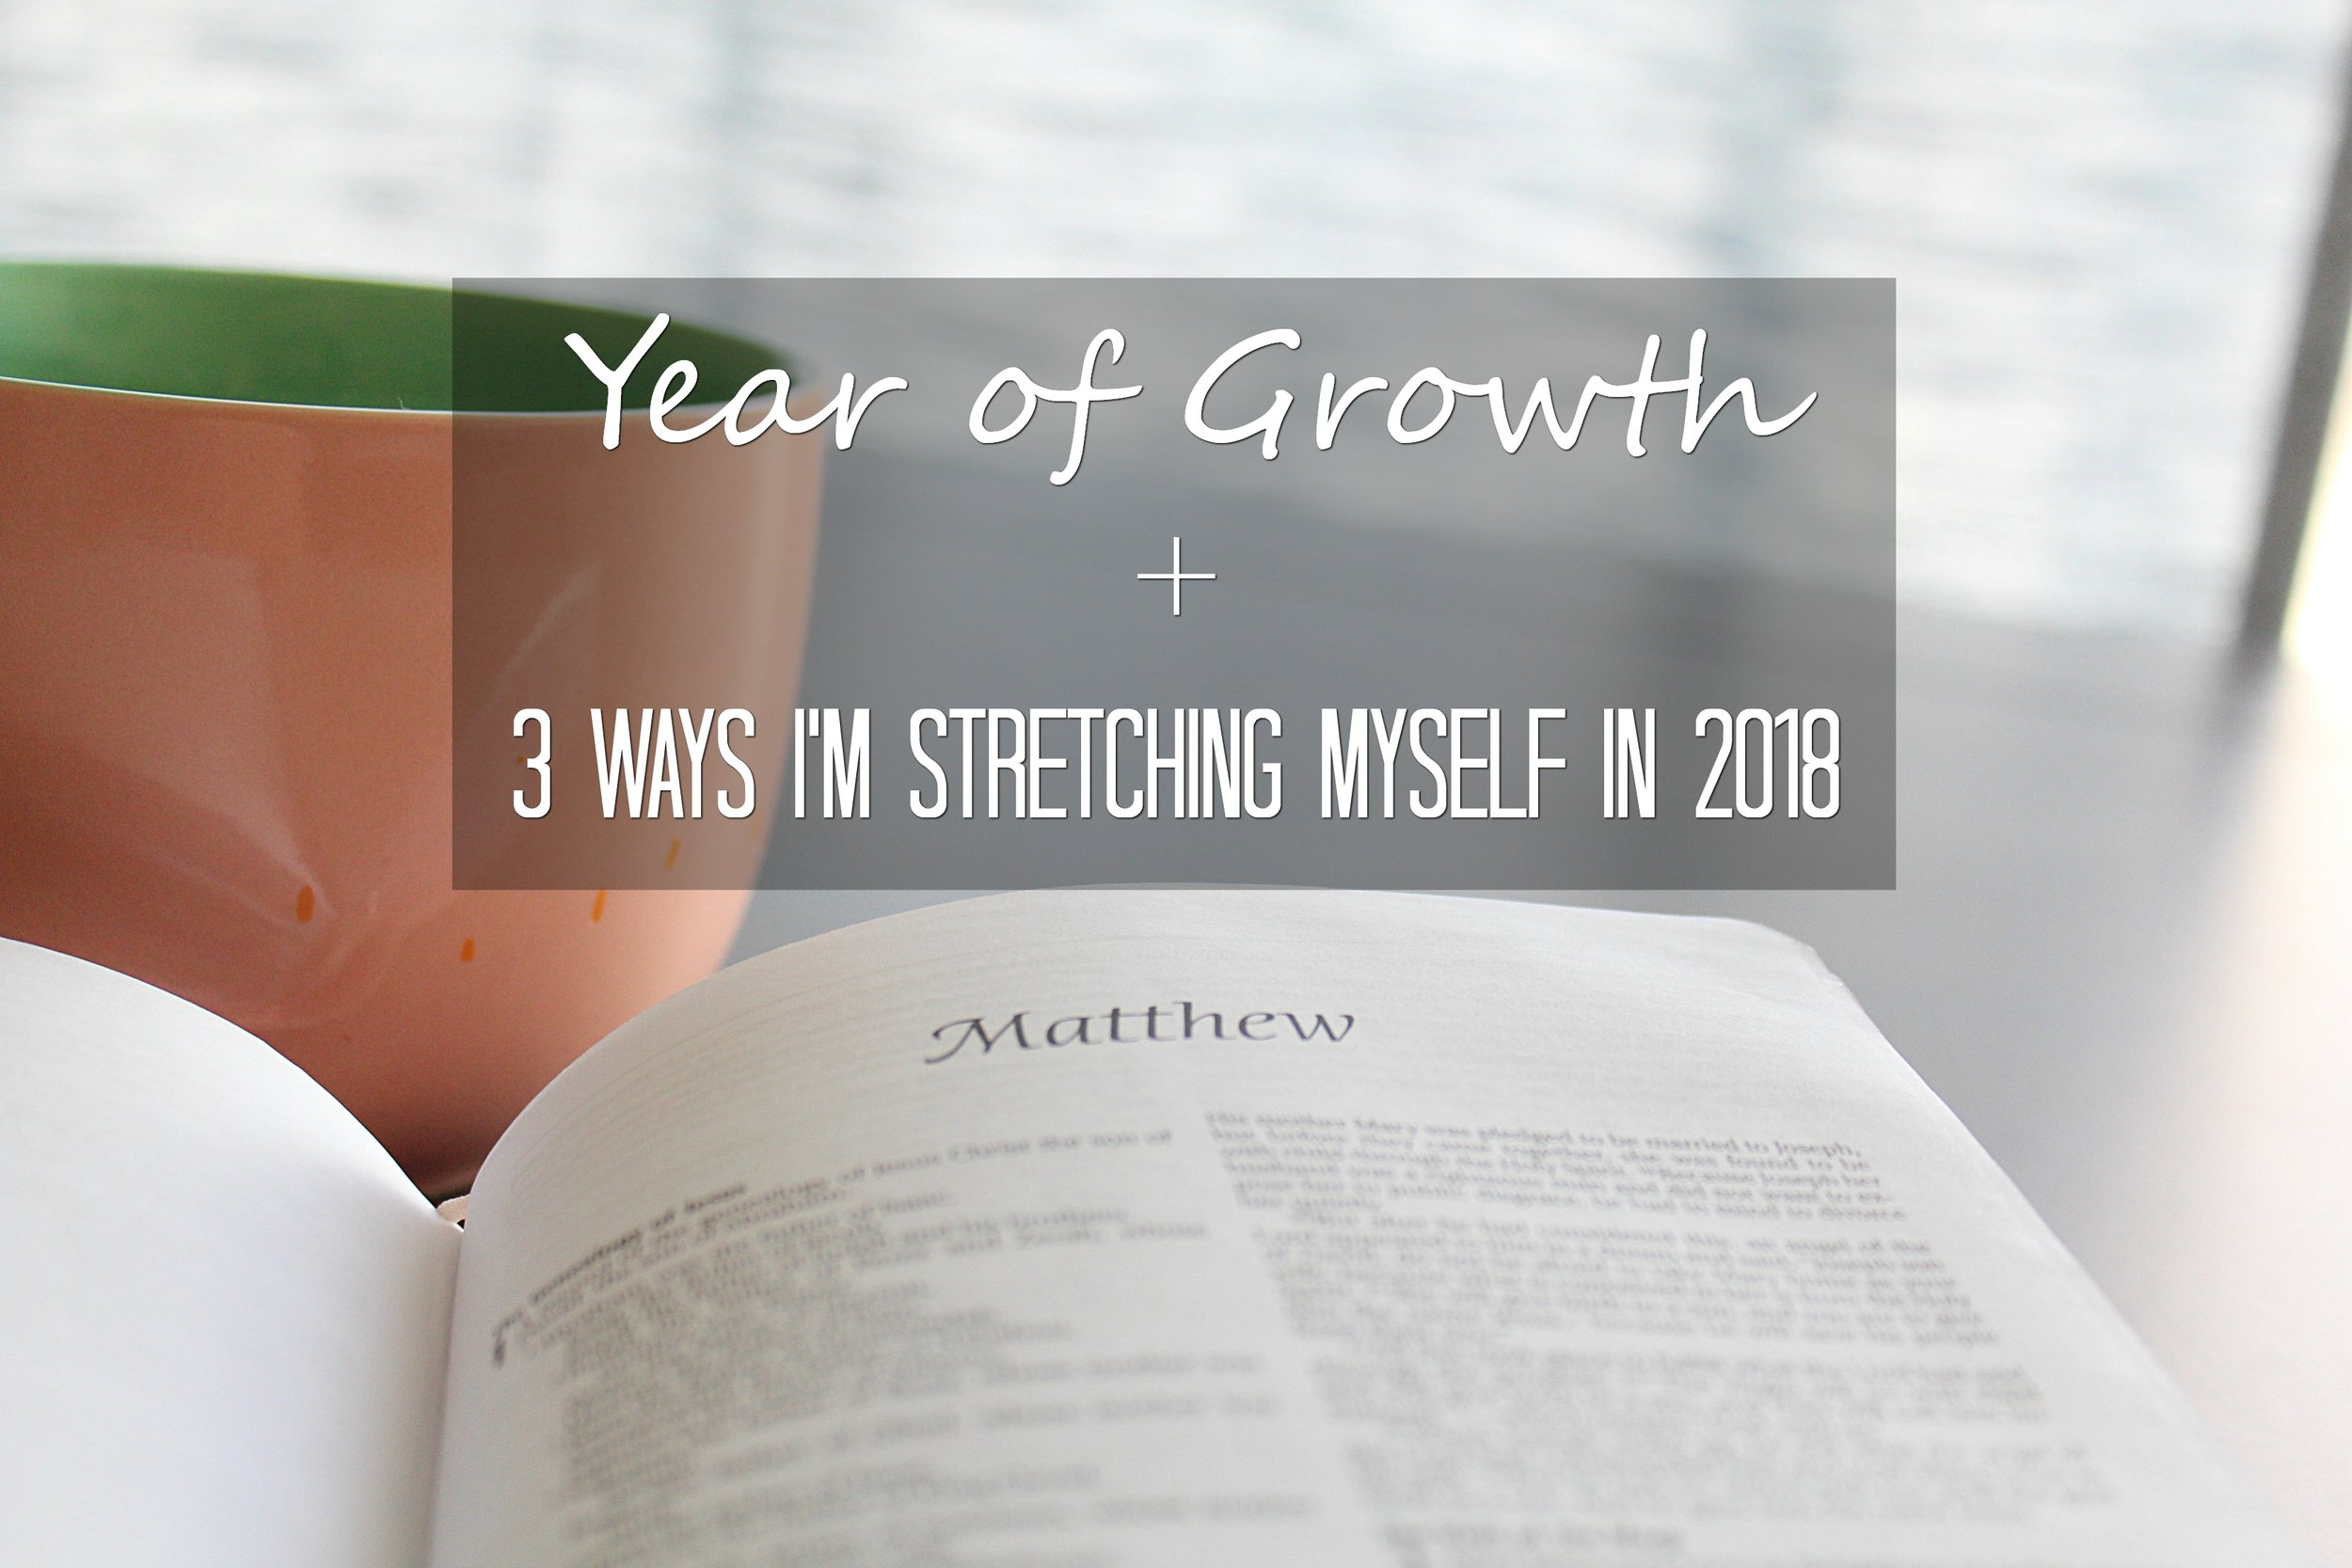 3-ways-im-stretching-myself-in-2018.jpg